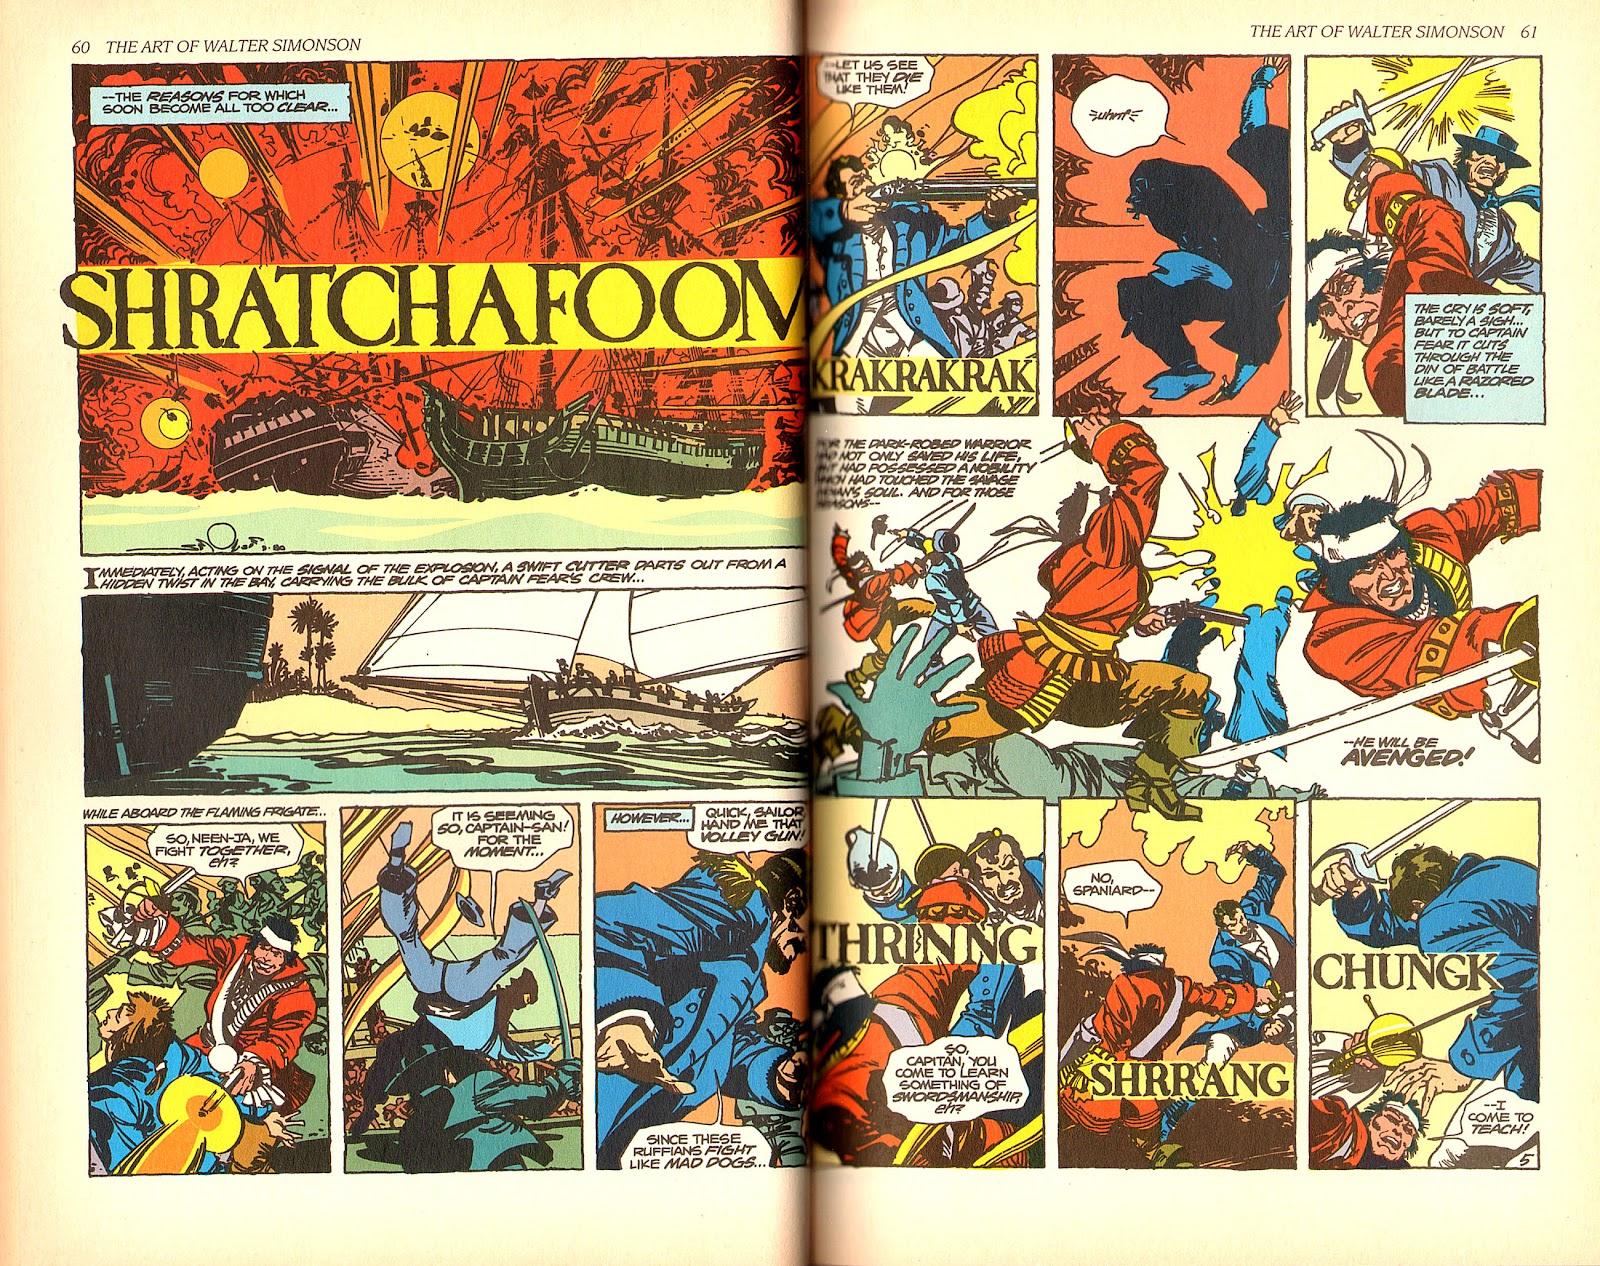 Read online The Art of Walter Simonson comic -  Issue # TPB - 32